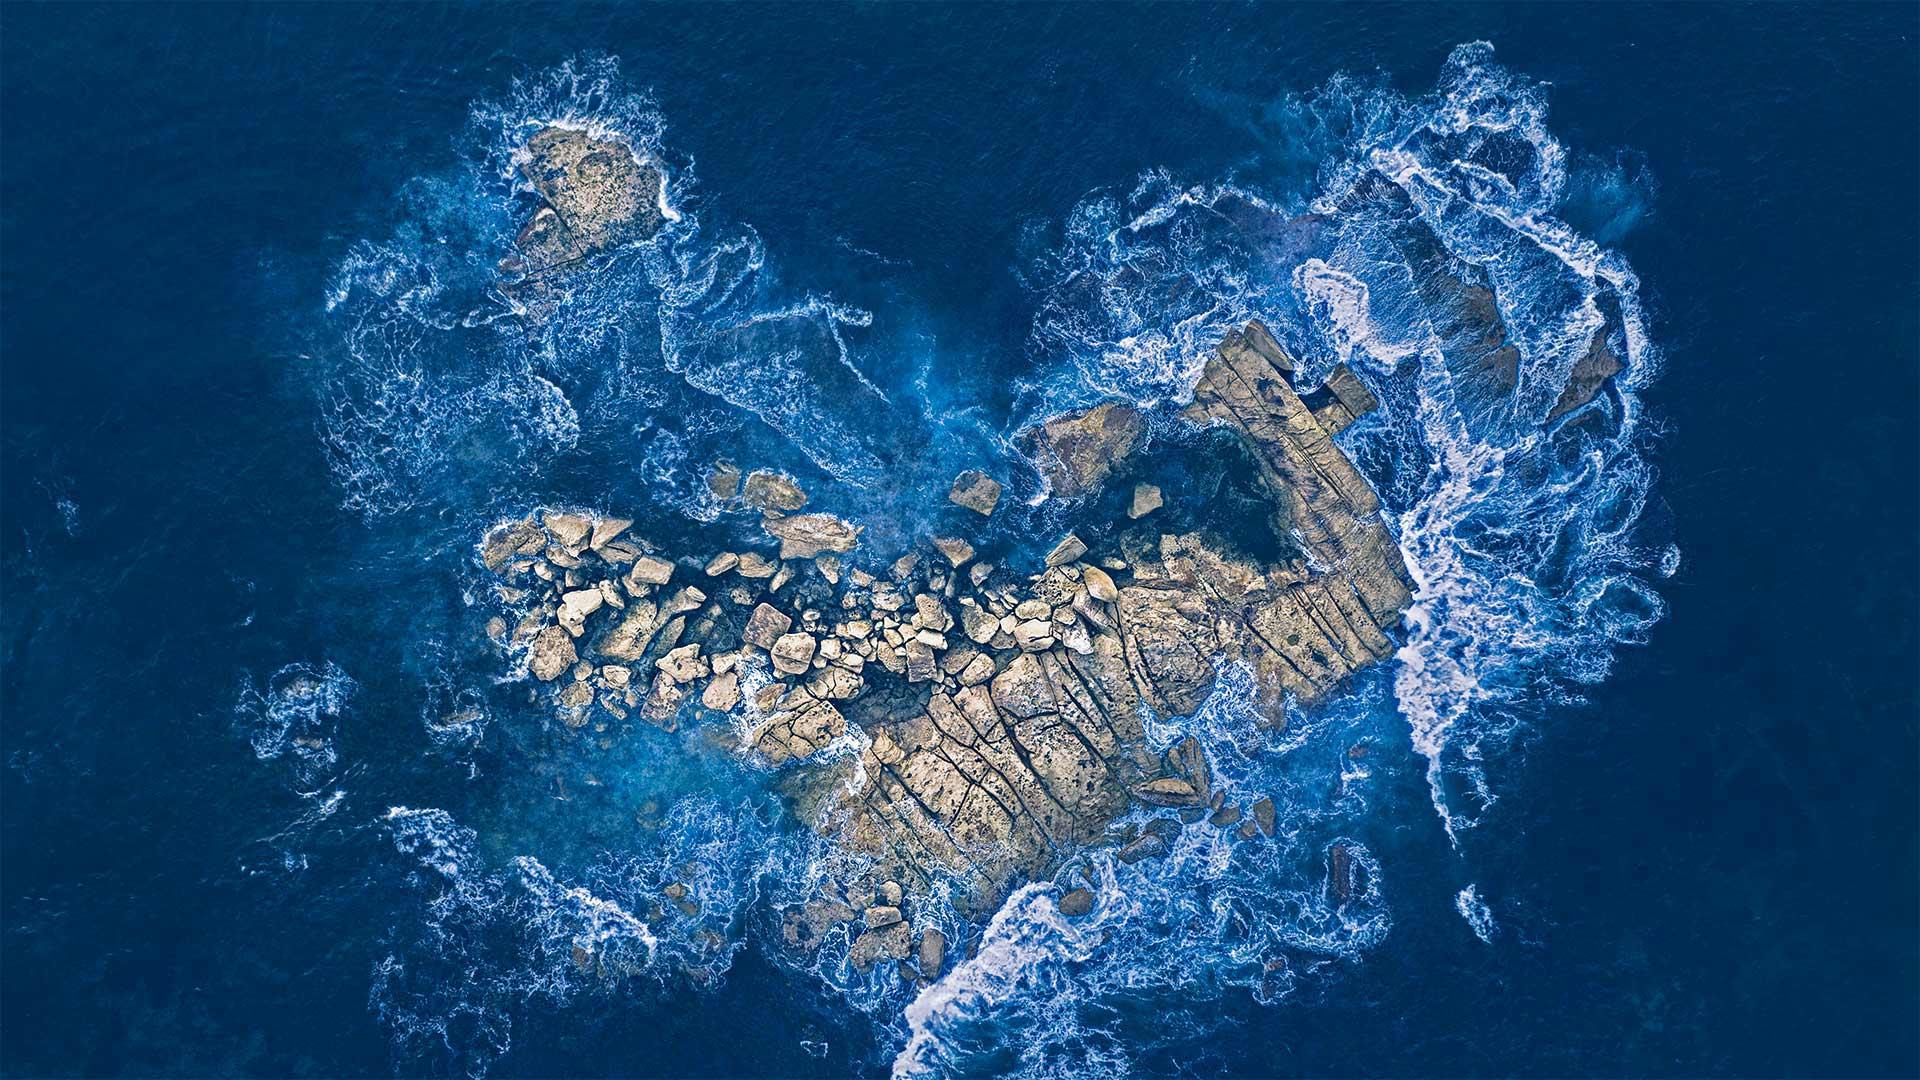 [Image: th?id=OHR.OceanHeart_FR-FR9683806556_192...0x1080.jpg]